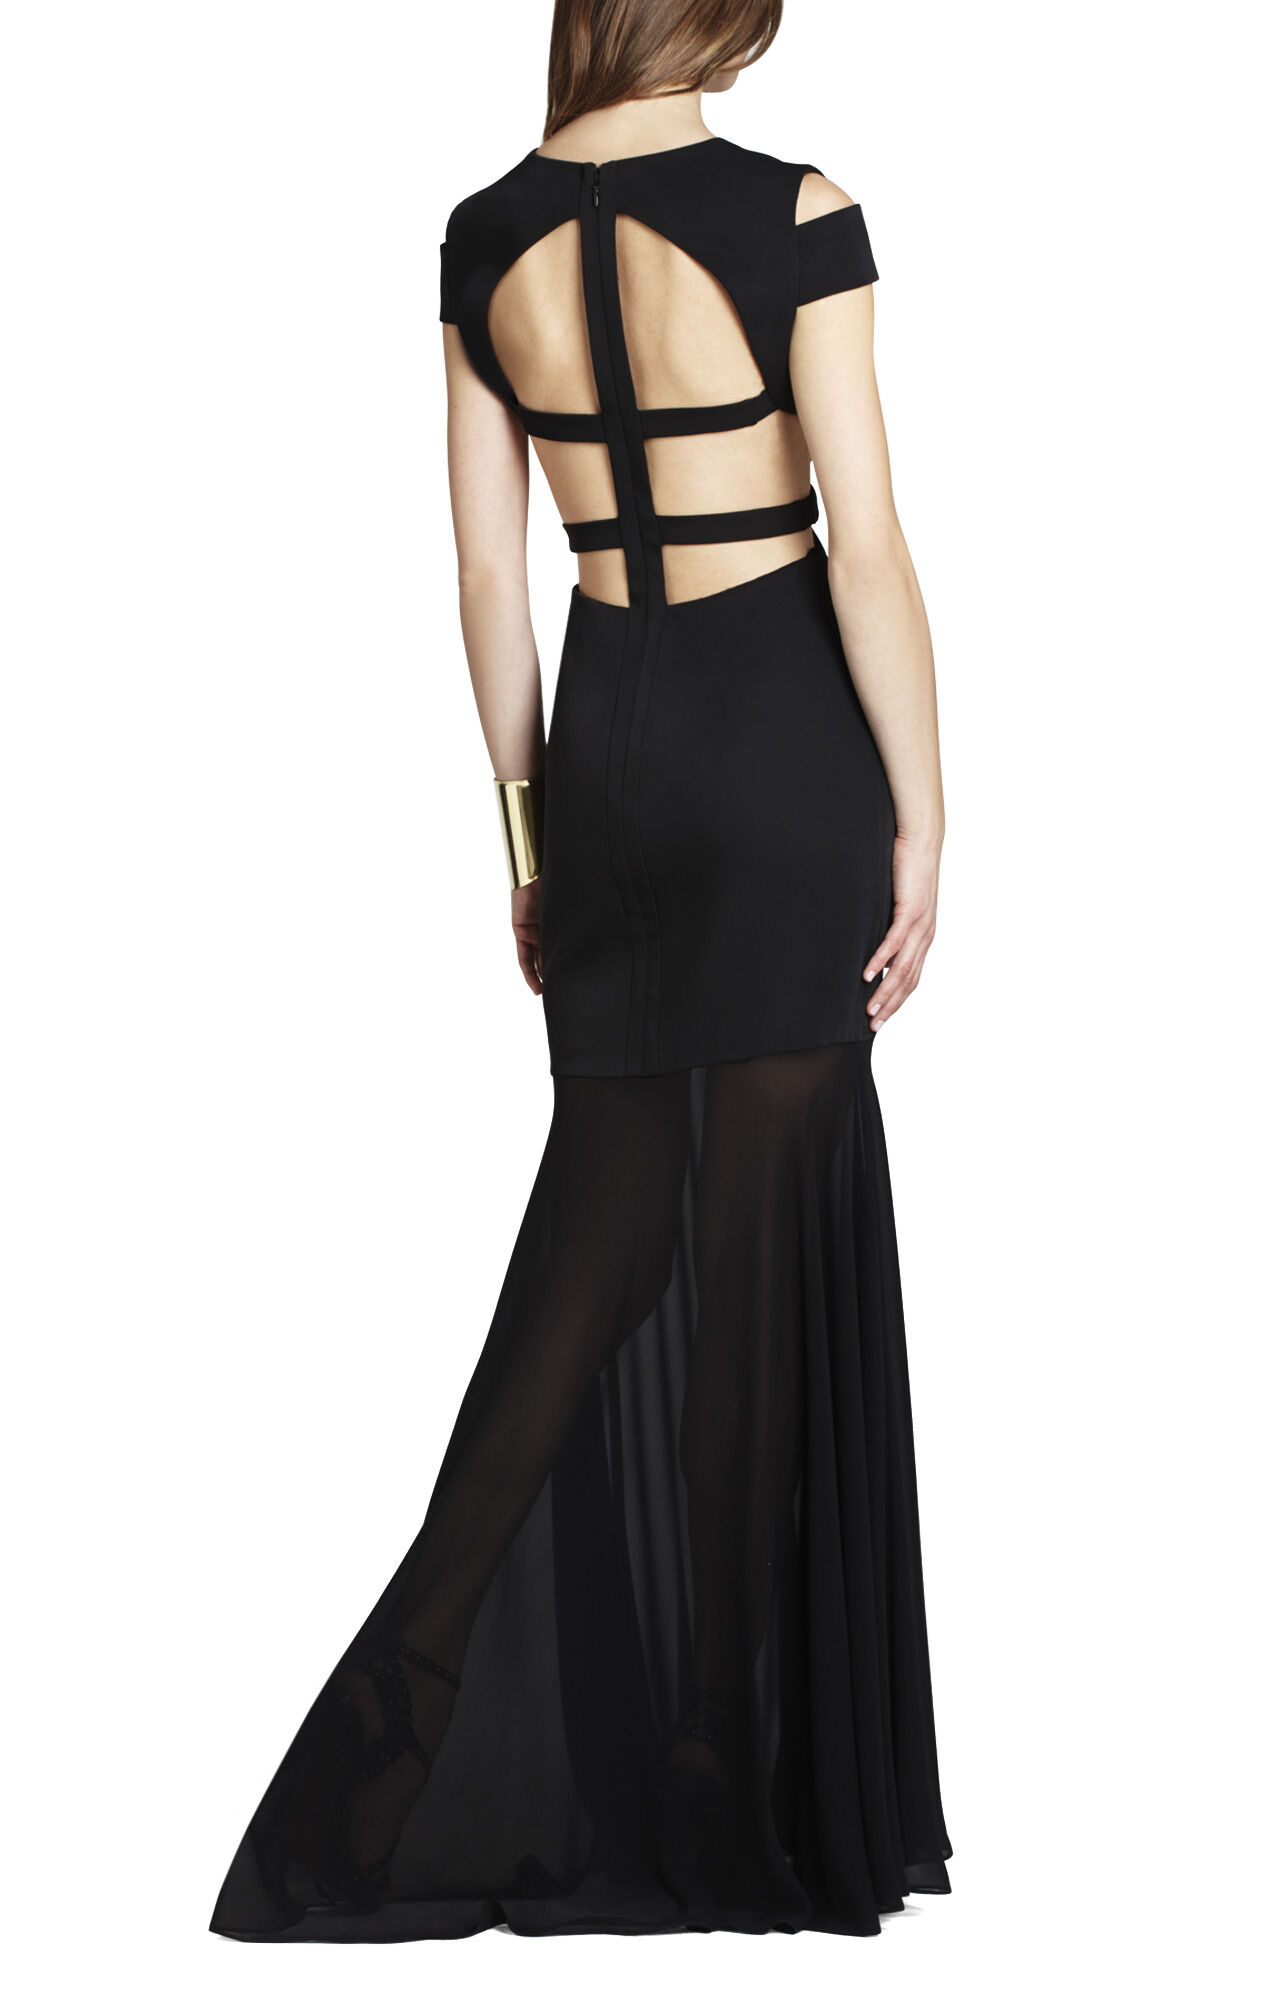 Ava Cutout Gown